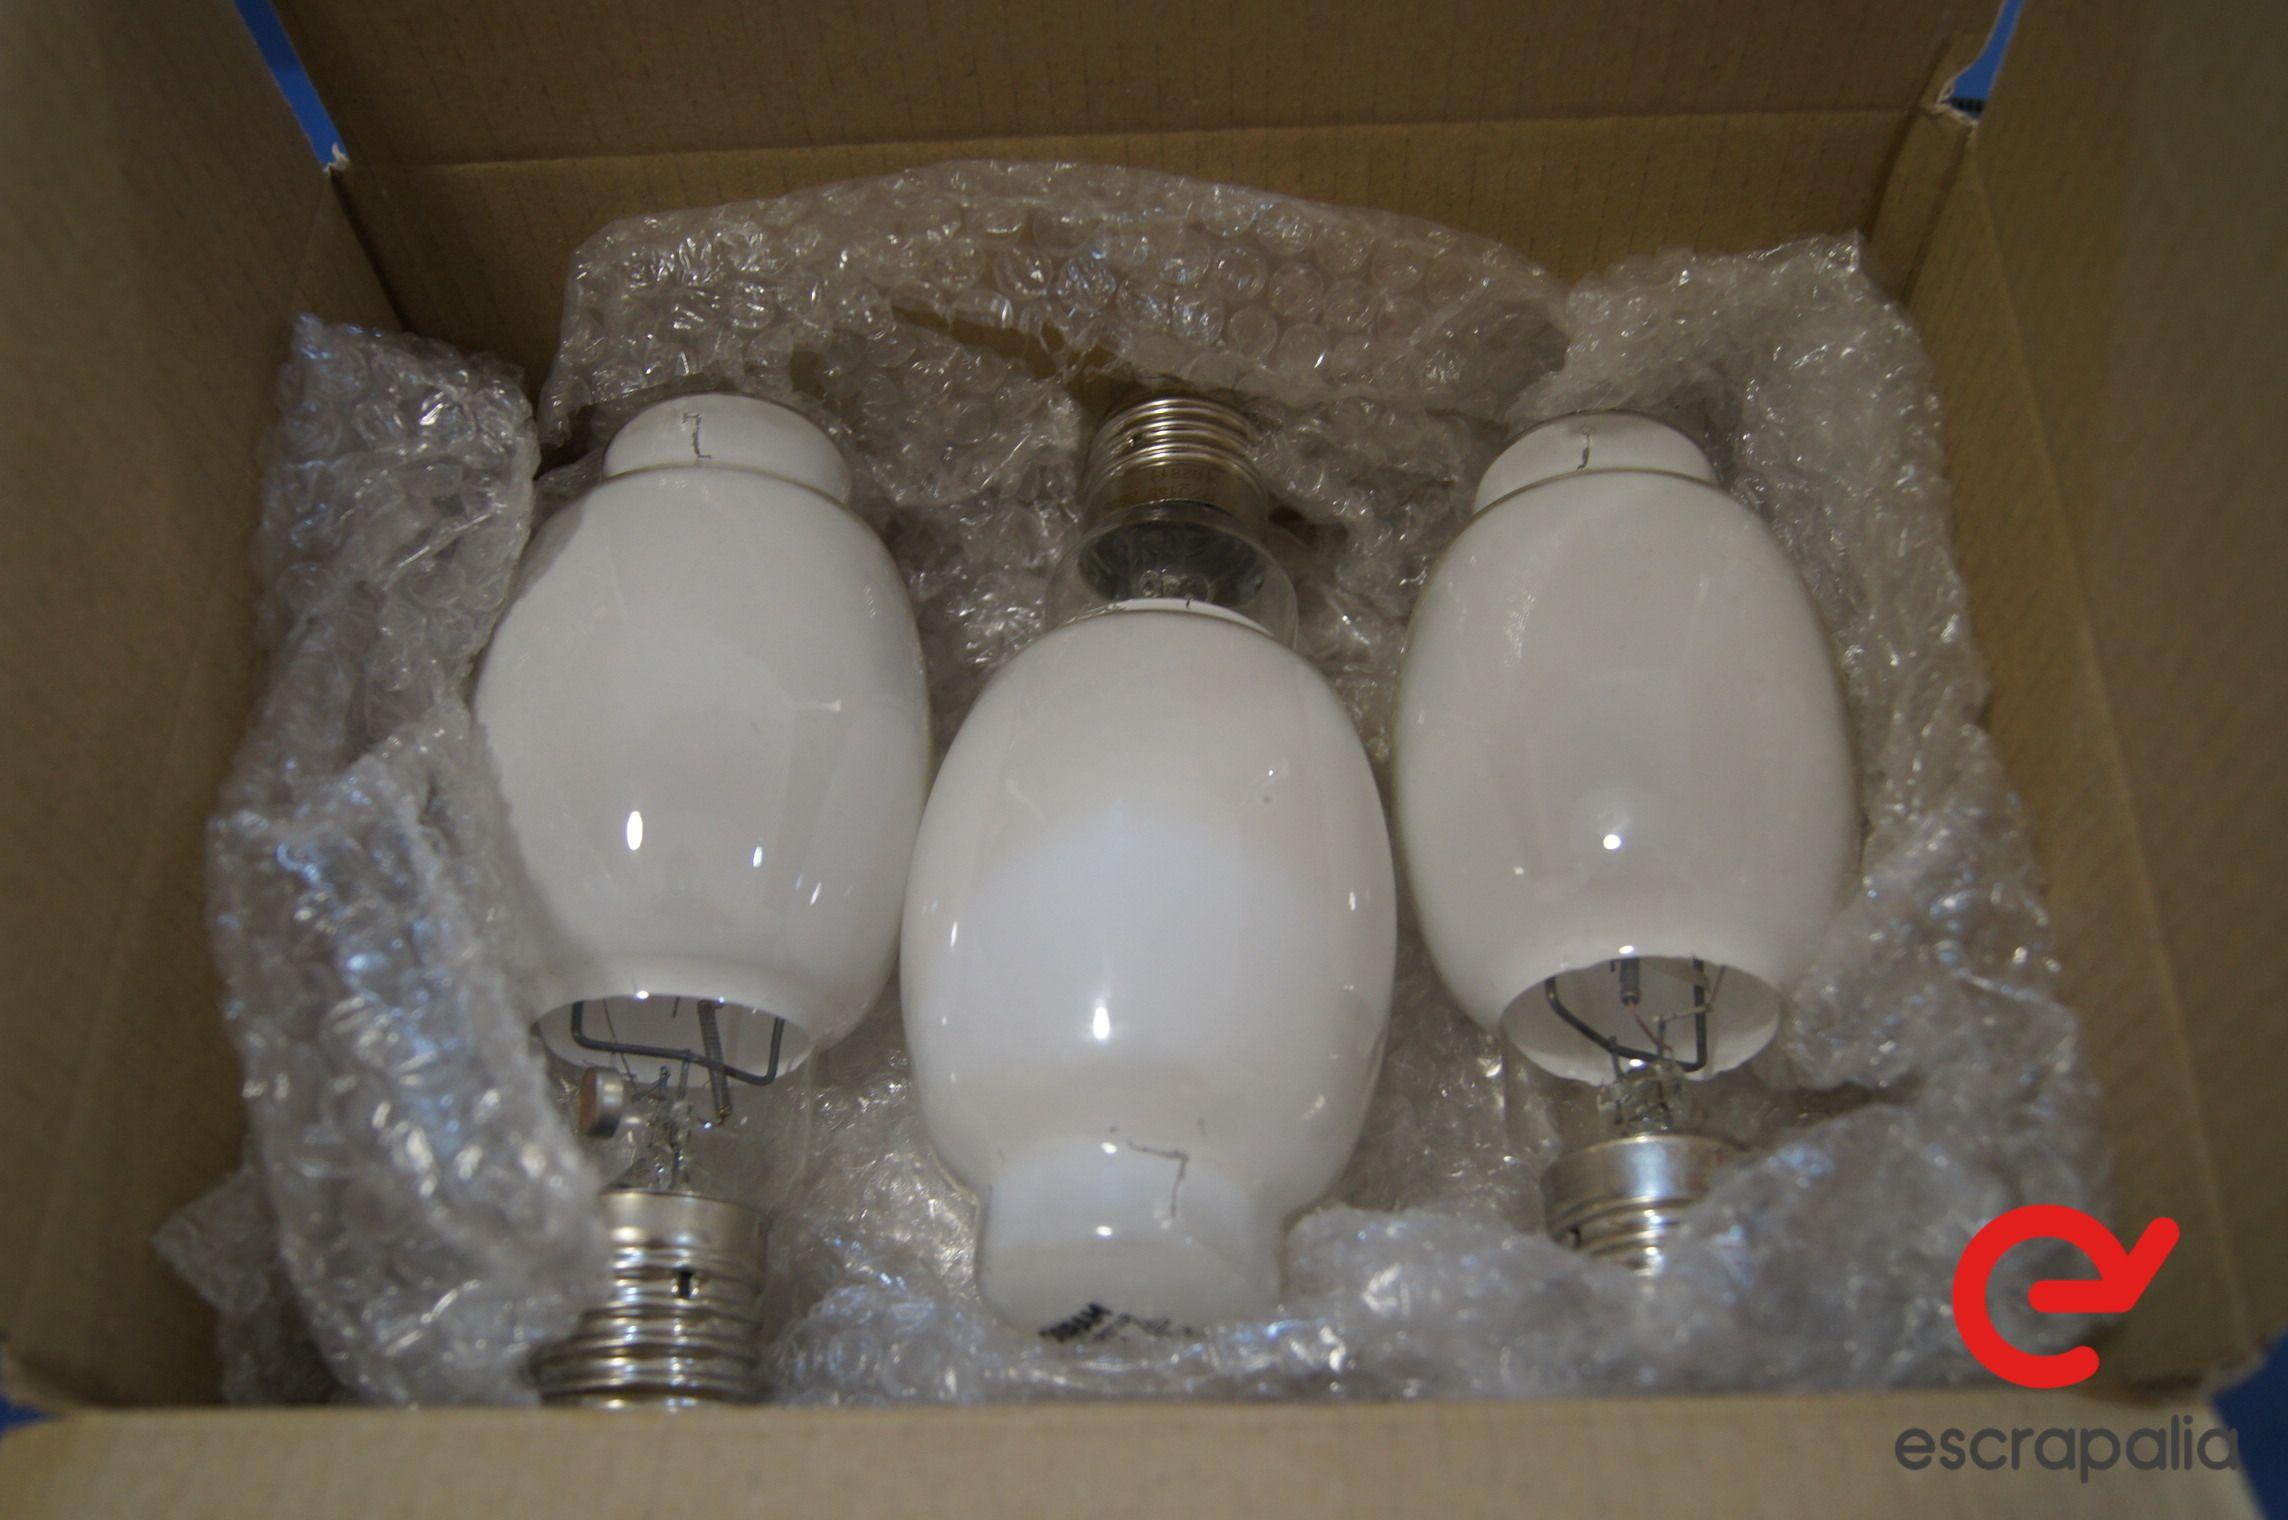 3 Einheiten E40 HQI-E-250W Glühlampe